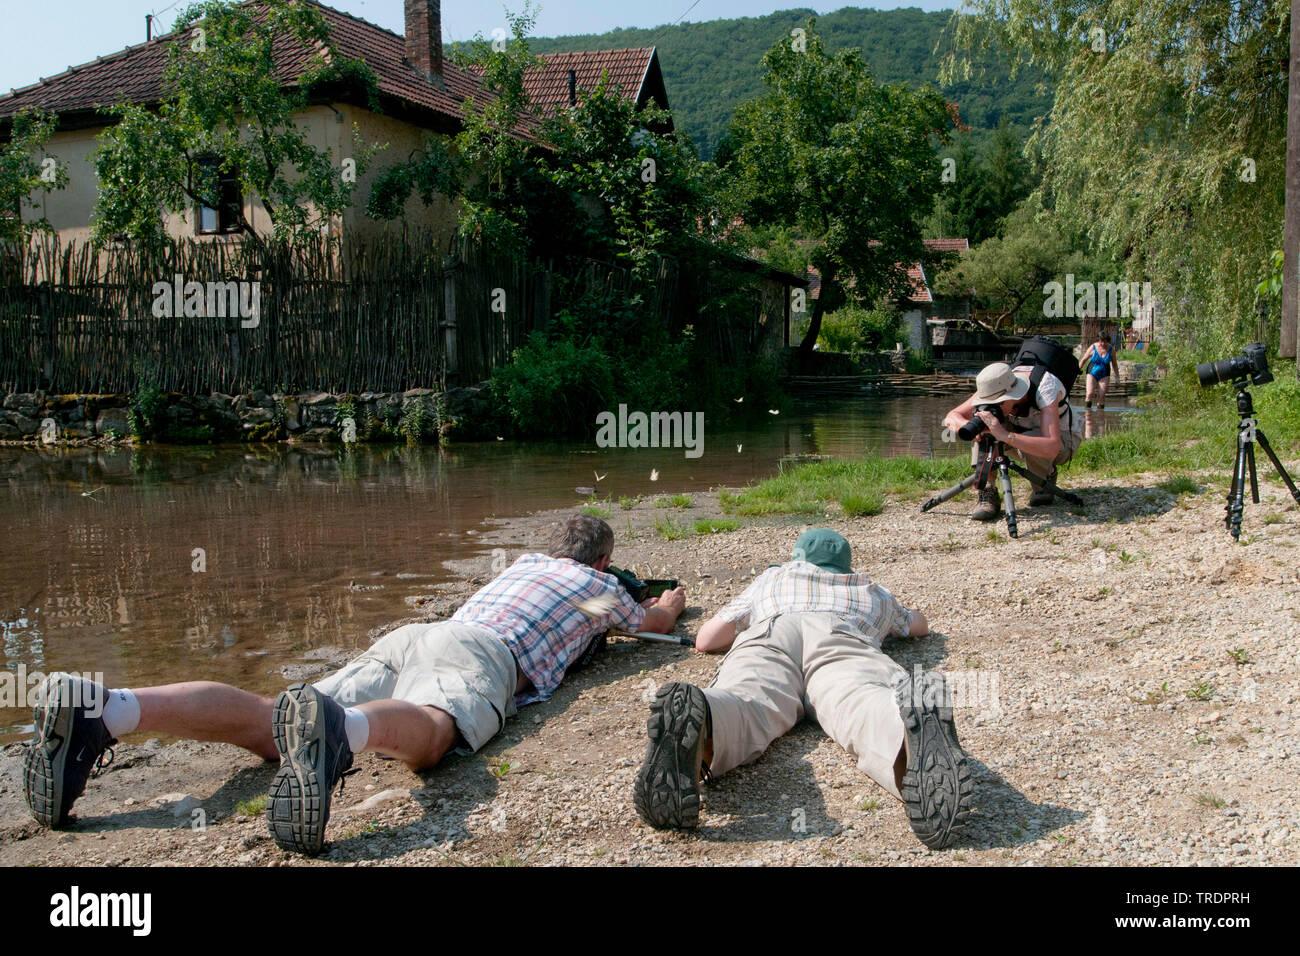 Fotografen liegen am Boden und fotografieren Schmetterlinge, Ungarn | lying on the ground taking photos of butterflies, Hungary | BLWS508895.jpg [ (c) - Stock Image